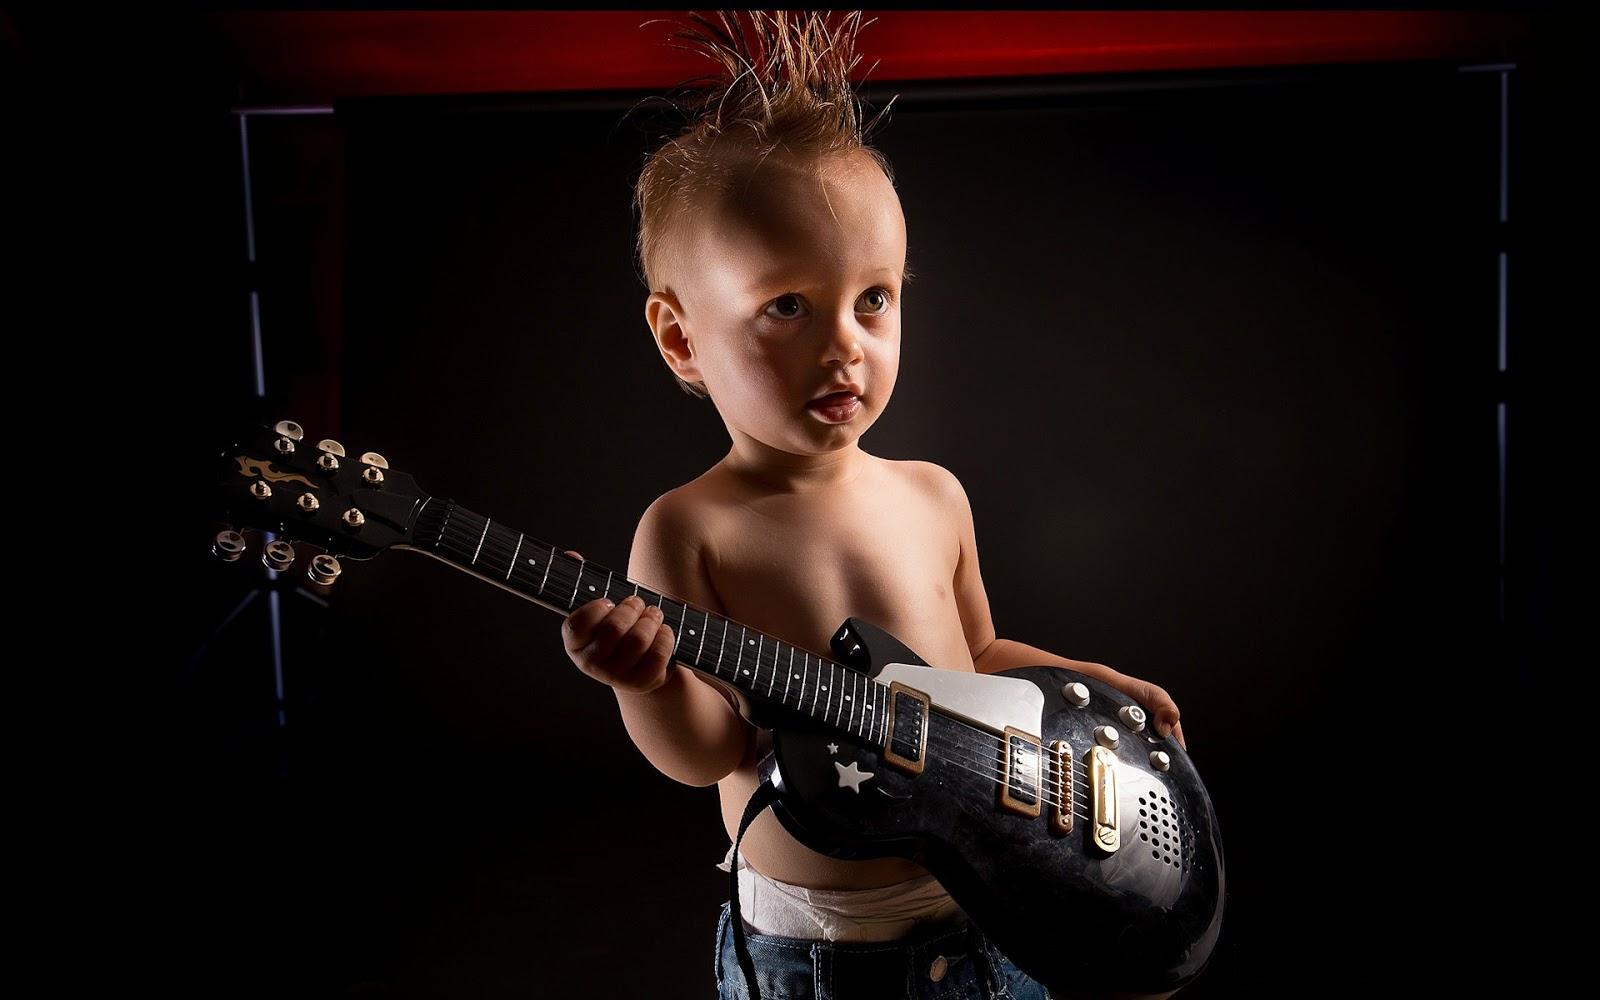 cute baby Cute Little Rock Baby With Gitar HD Wallpaper 1600x1000